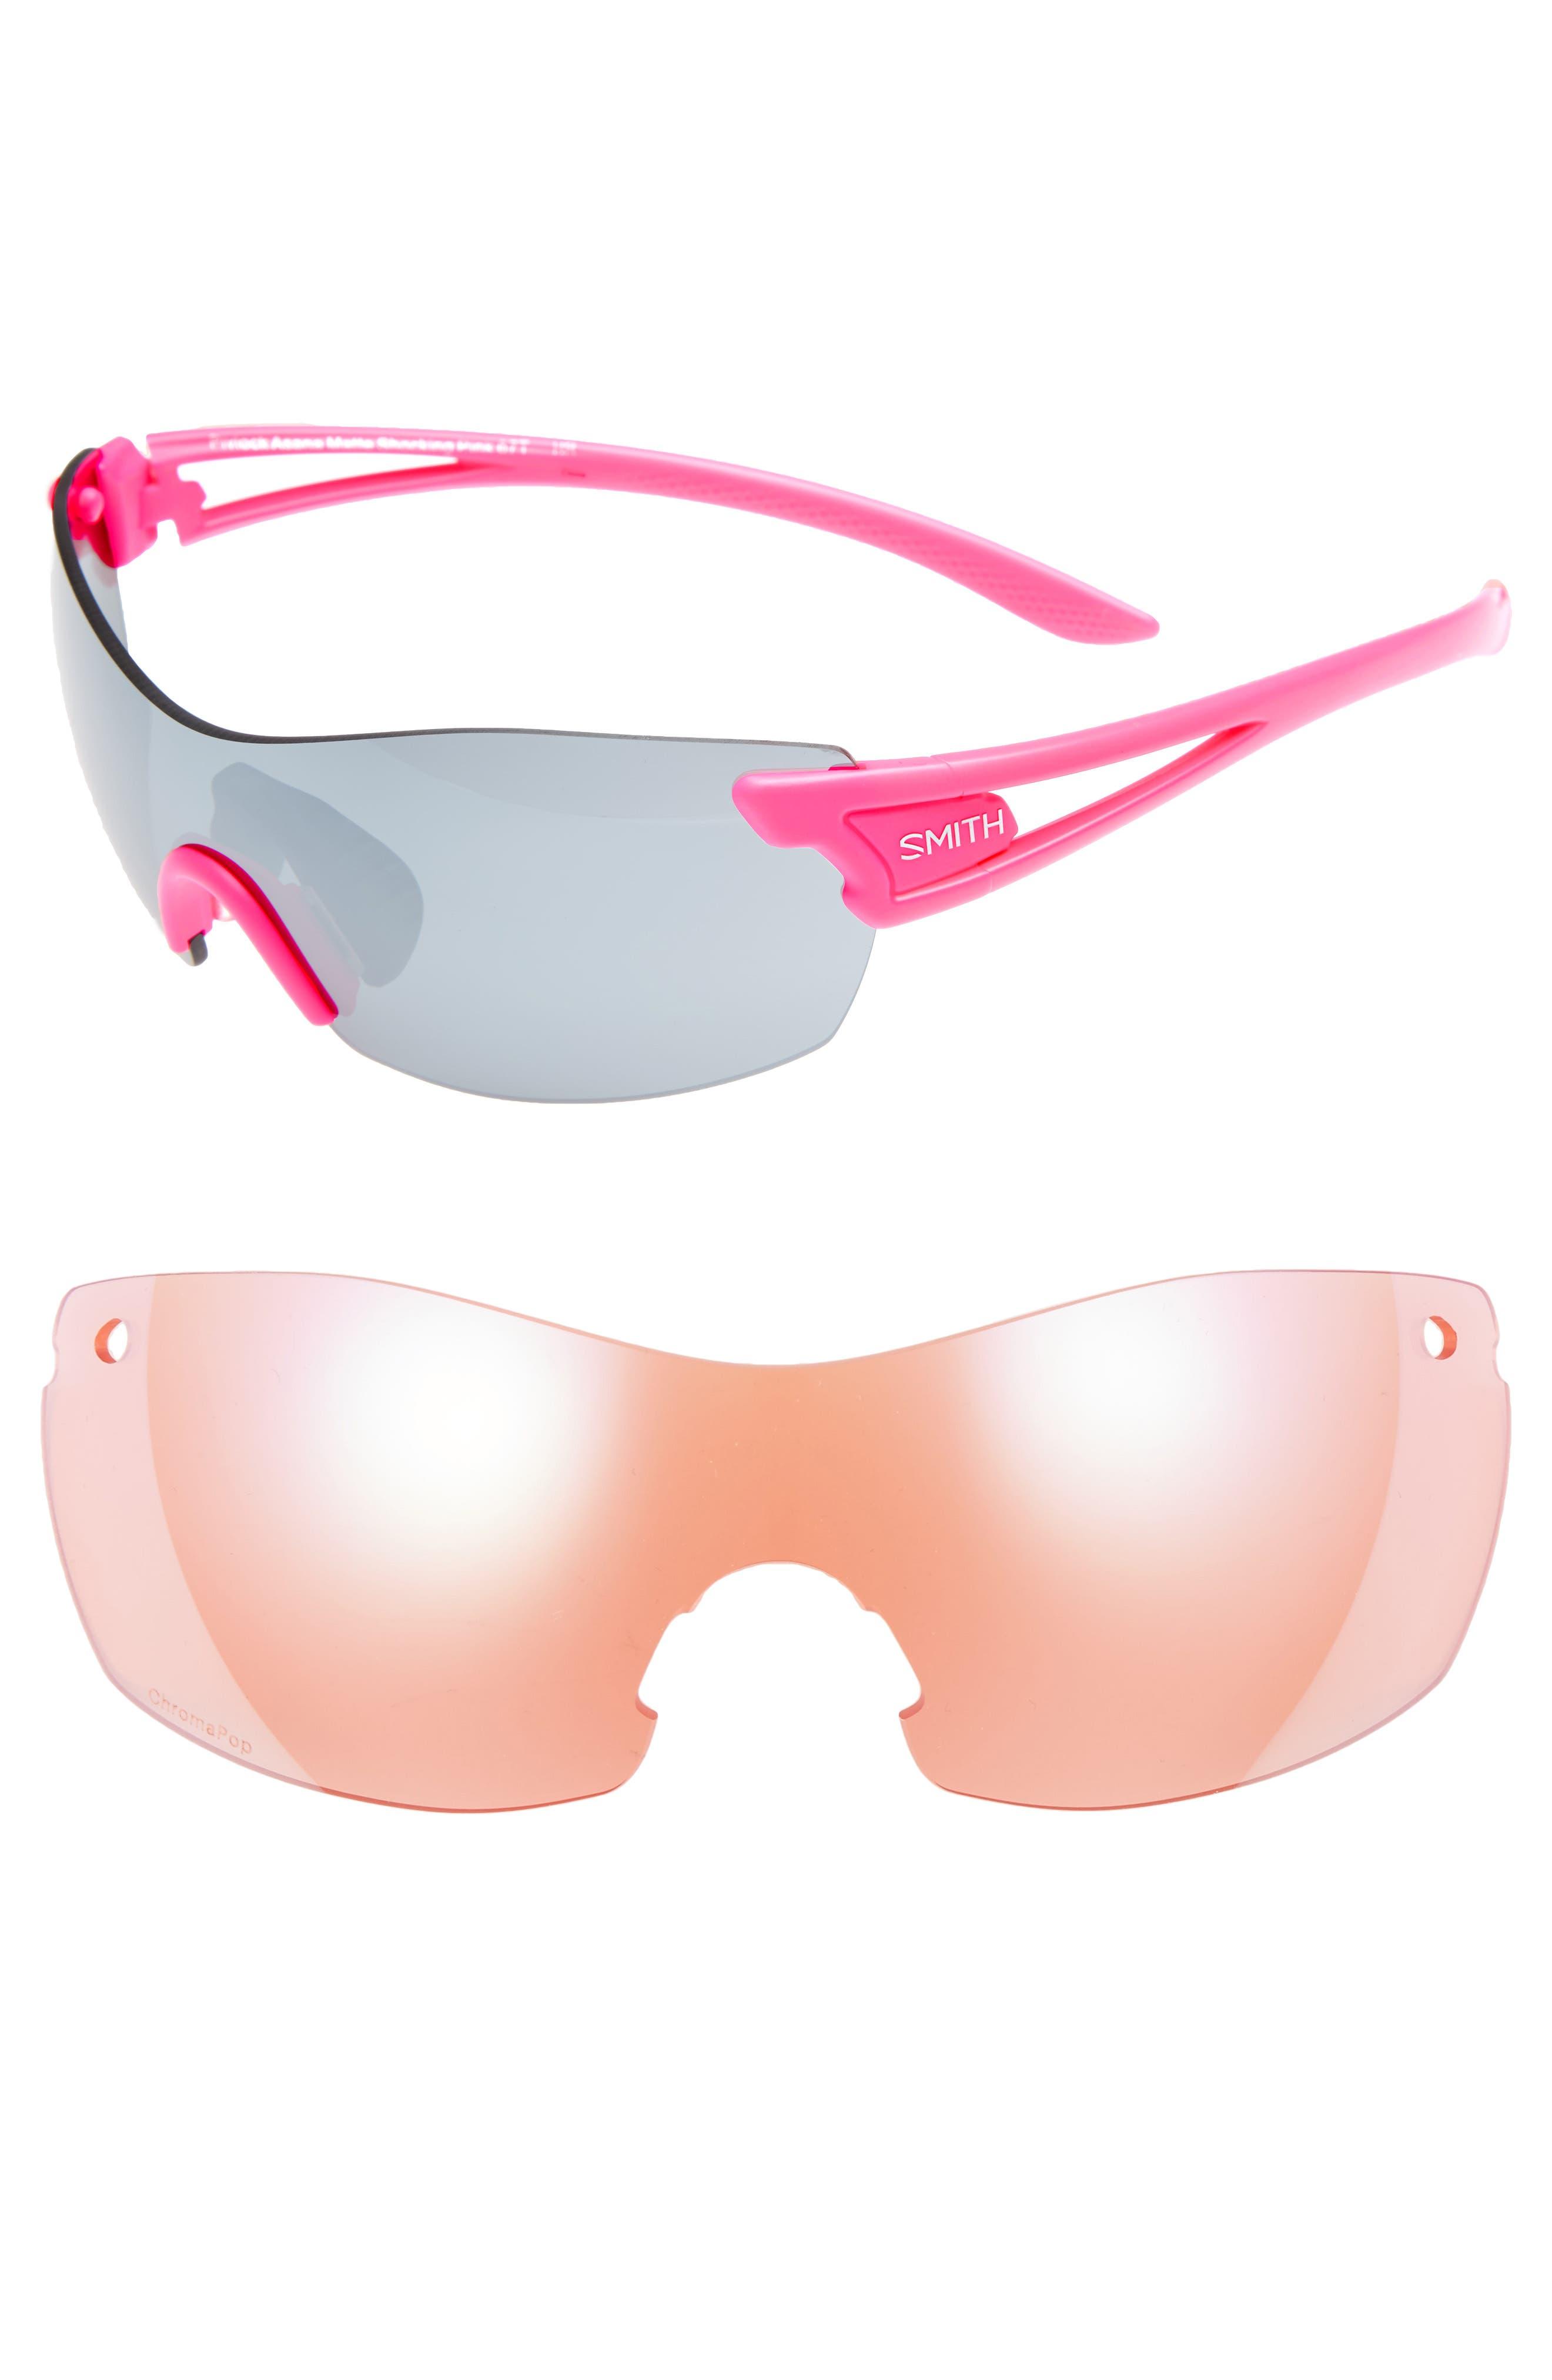 PivLock<sup>™</sup> Asana 150mm ChromaPop Polarized Sunglasses,                             Alternate thumbnail 12, color,